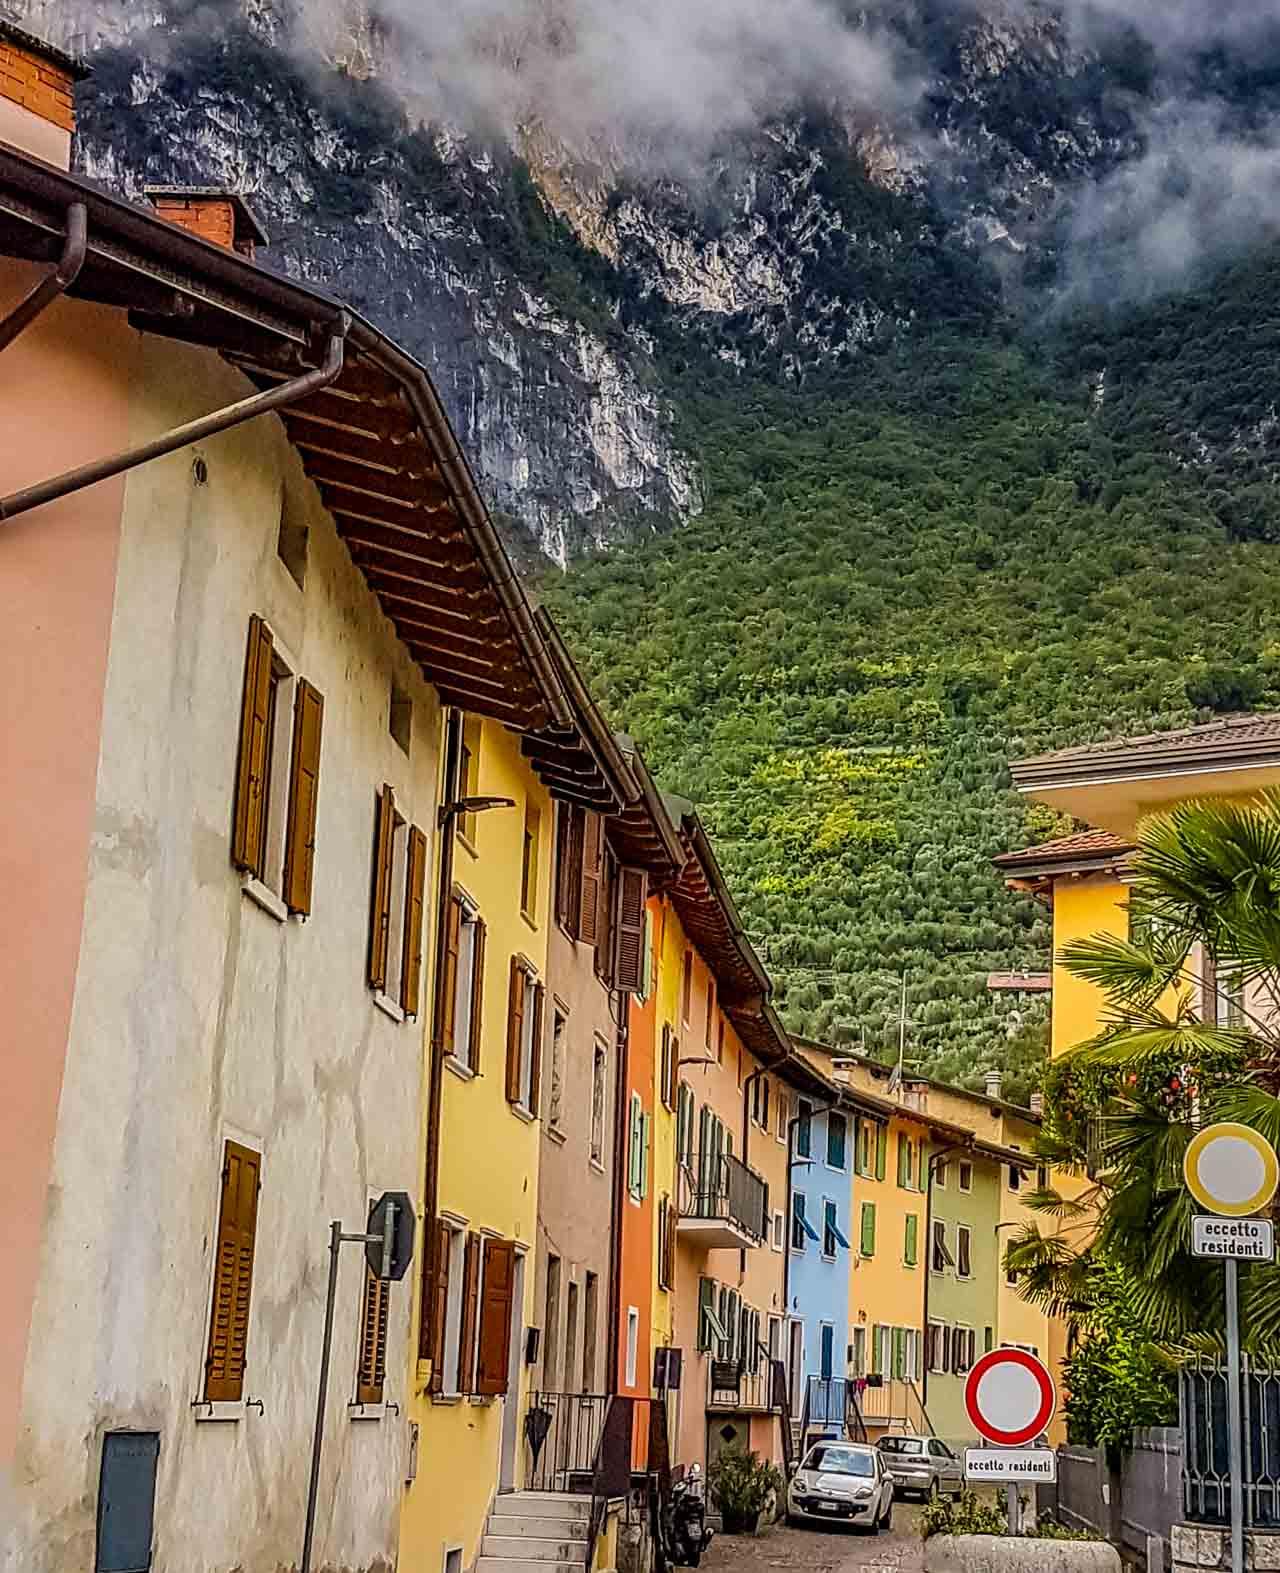 20170916_134418 Lake Garda (Lago di Garda) - Italy